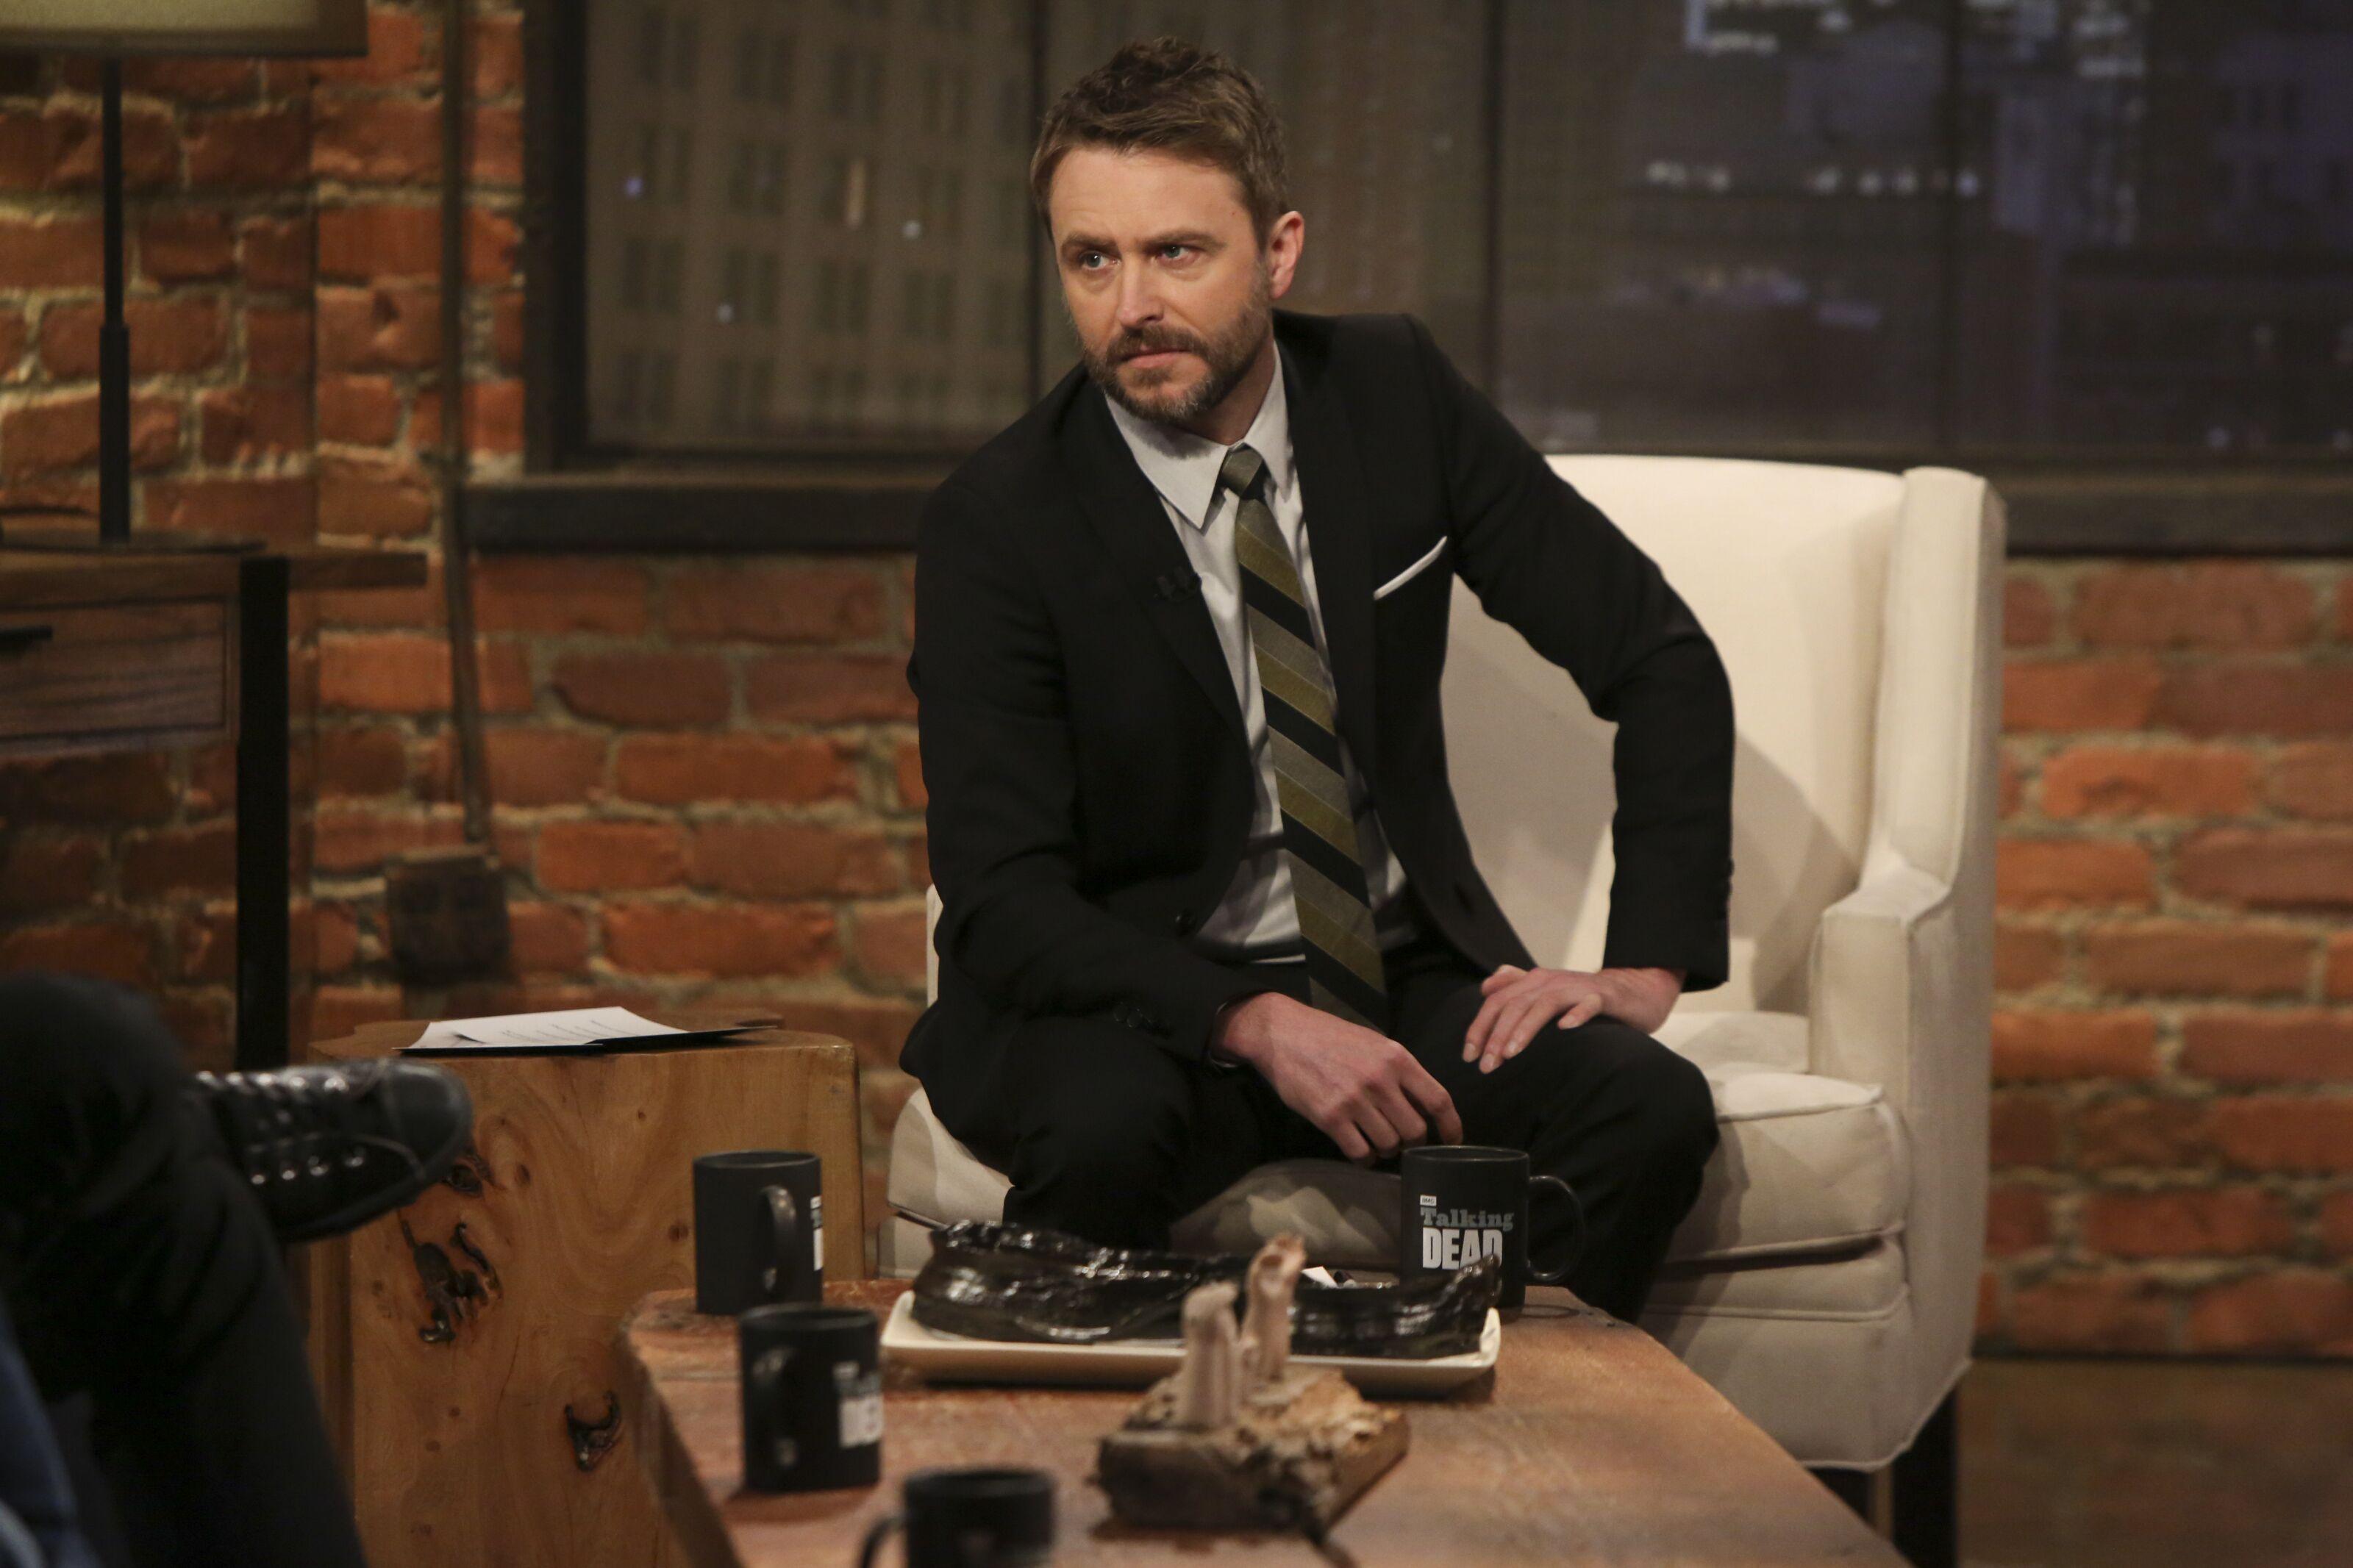 Talking Dead guests for The Walking Dead episode 1009 on Feb. 23